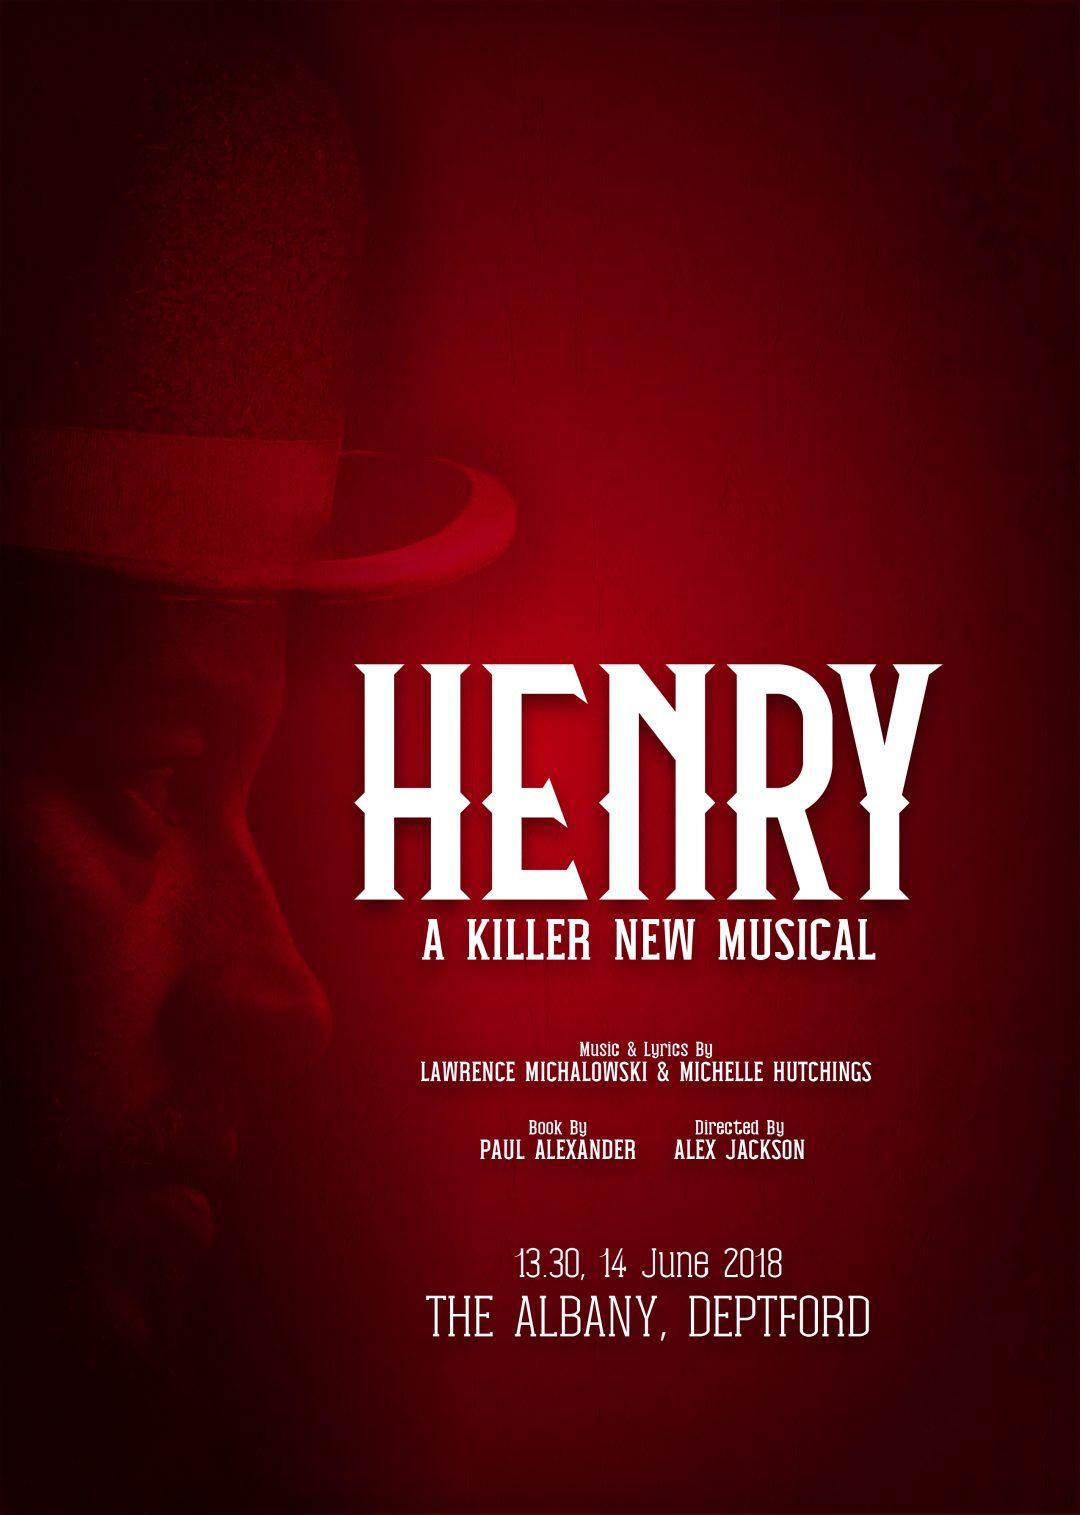 Henry: A Killer New Musical (Graphic design)